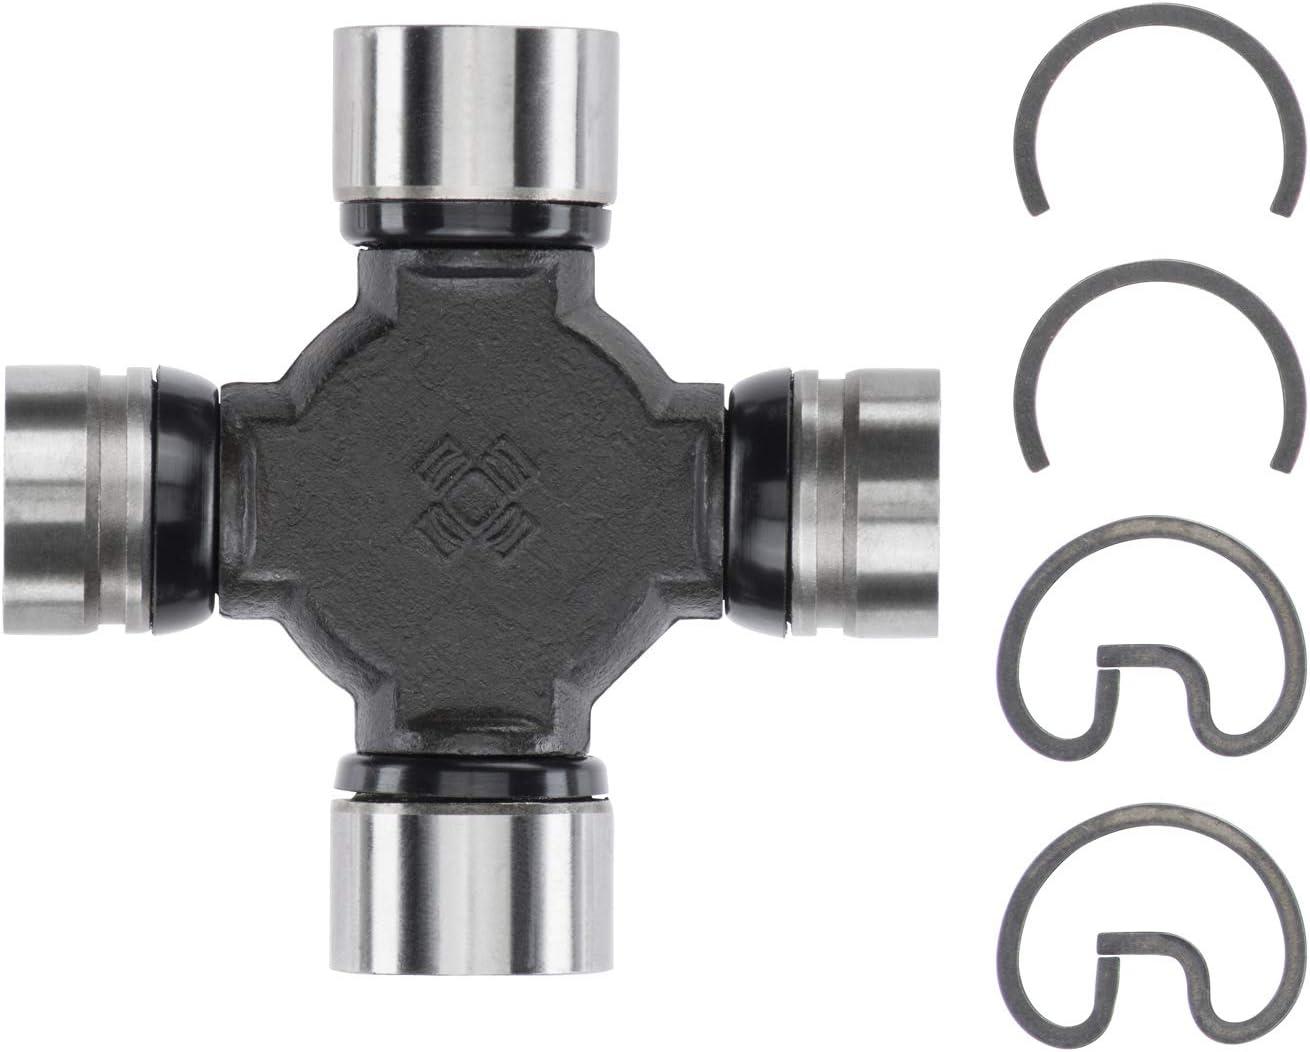 Moog 264 Super Strength Universal Joint